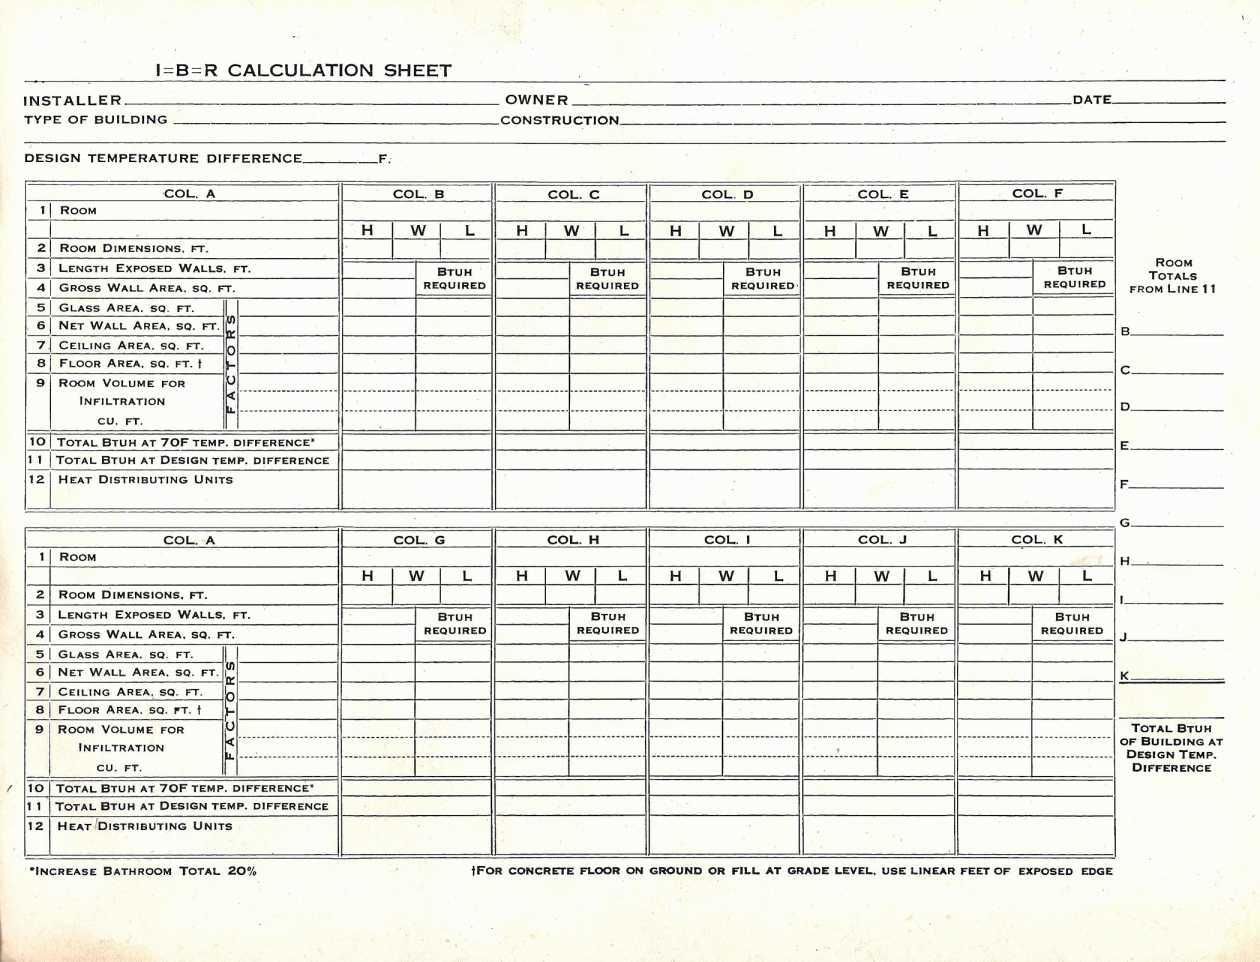 Hvac Inventory Spreadsheet Regarding Hvac Load Calculation Spreadsheet  Aljererlotgd